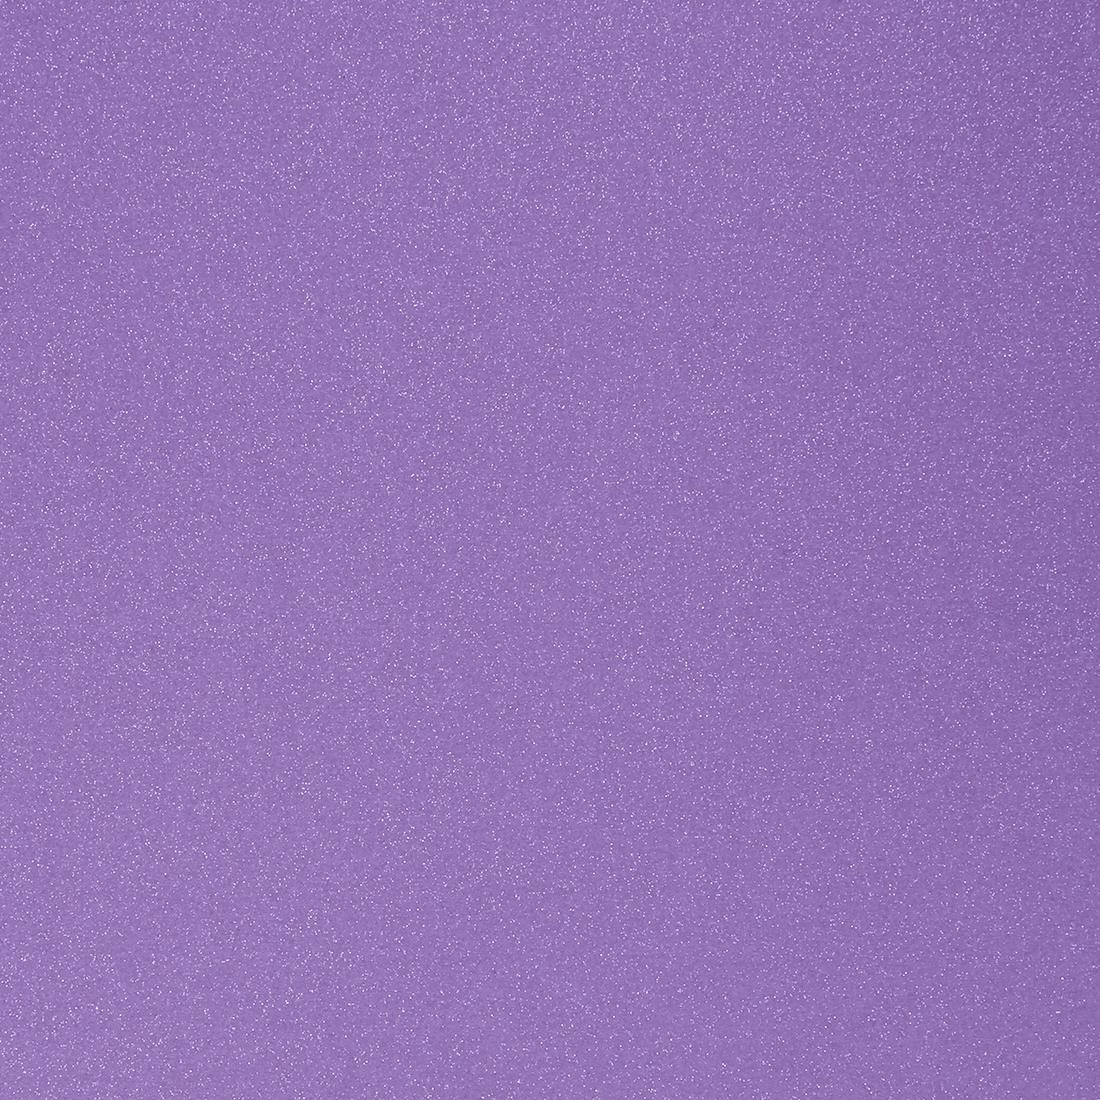 Glitter Cotton Lilac Craft Fabric